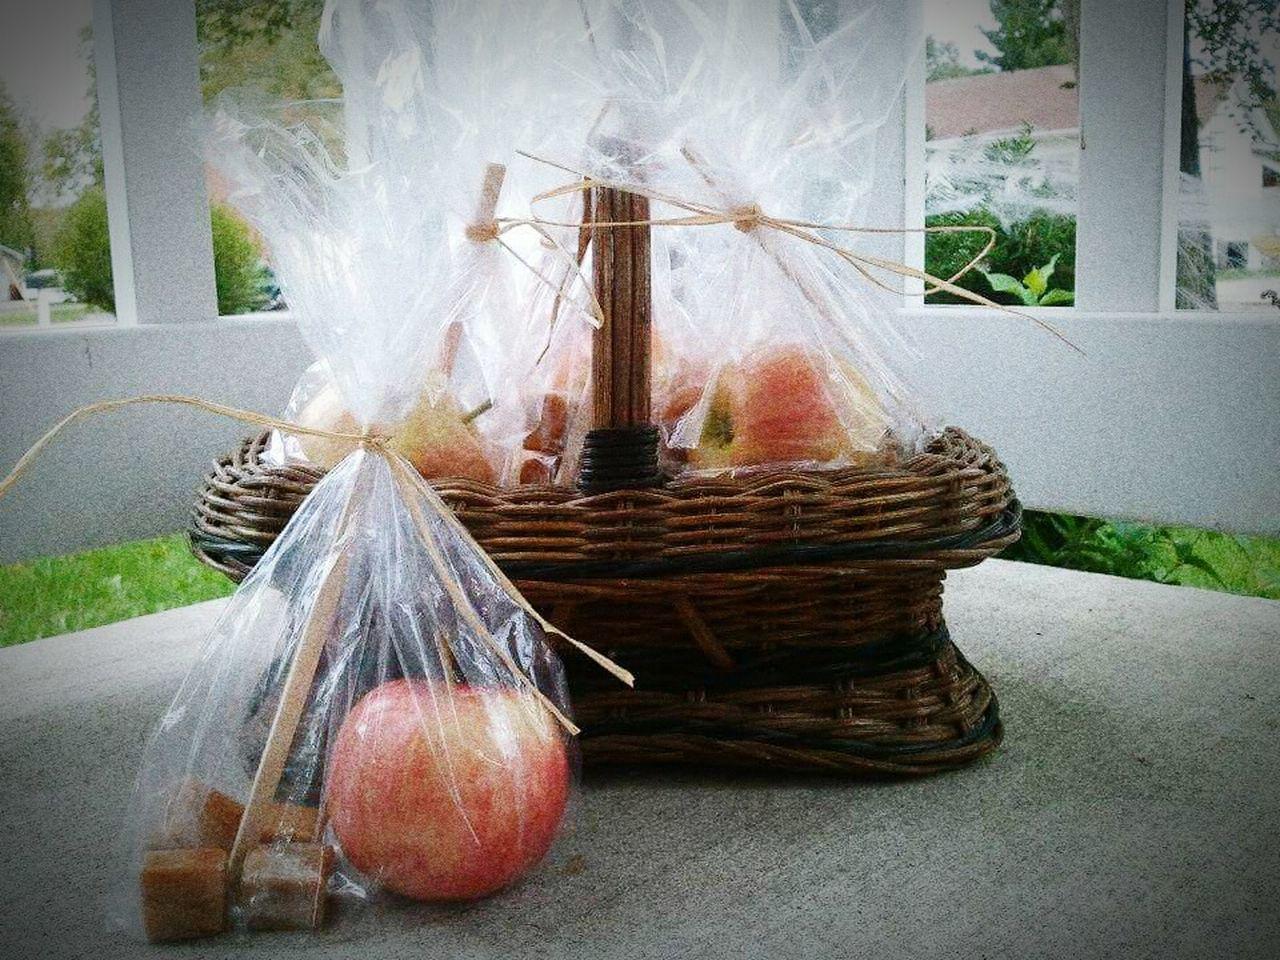 Apple Caramel Caramel Apples Basket